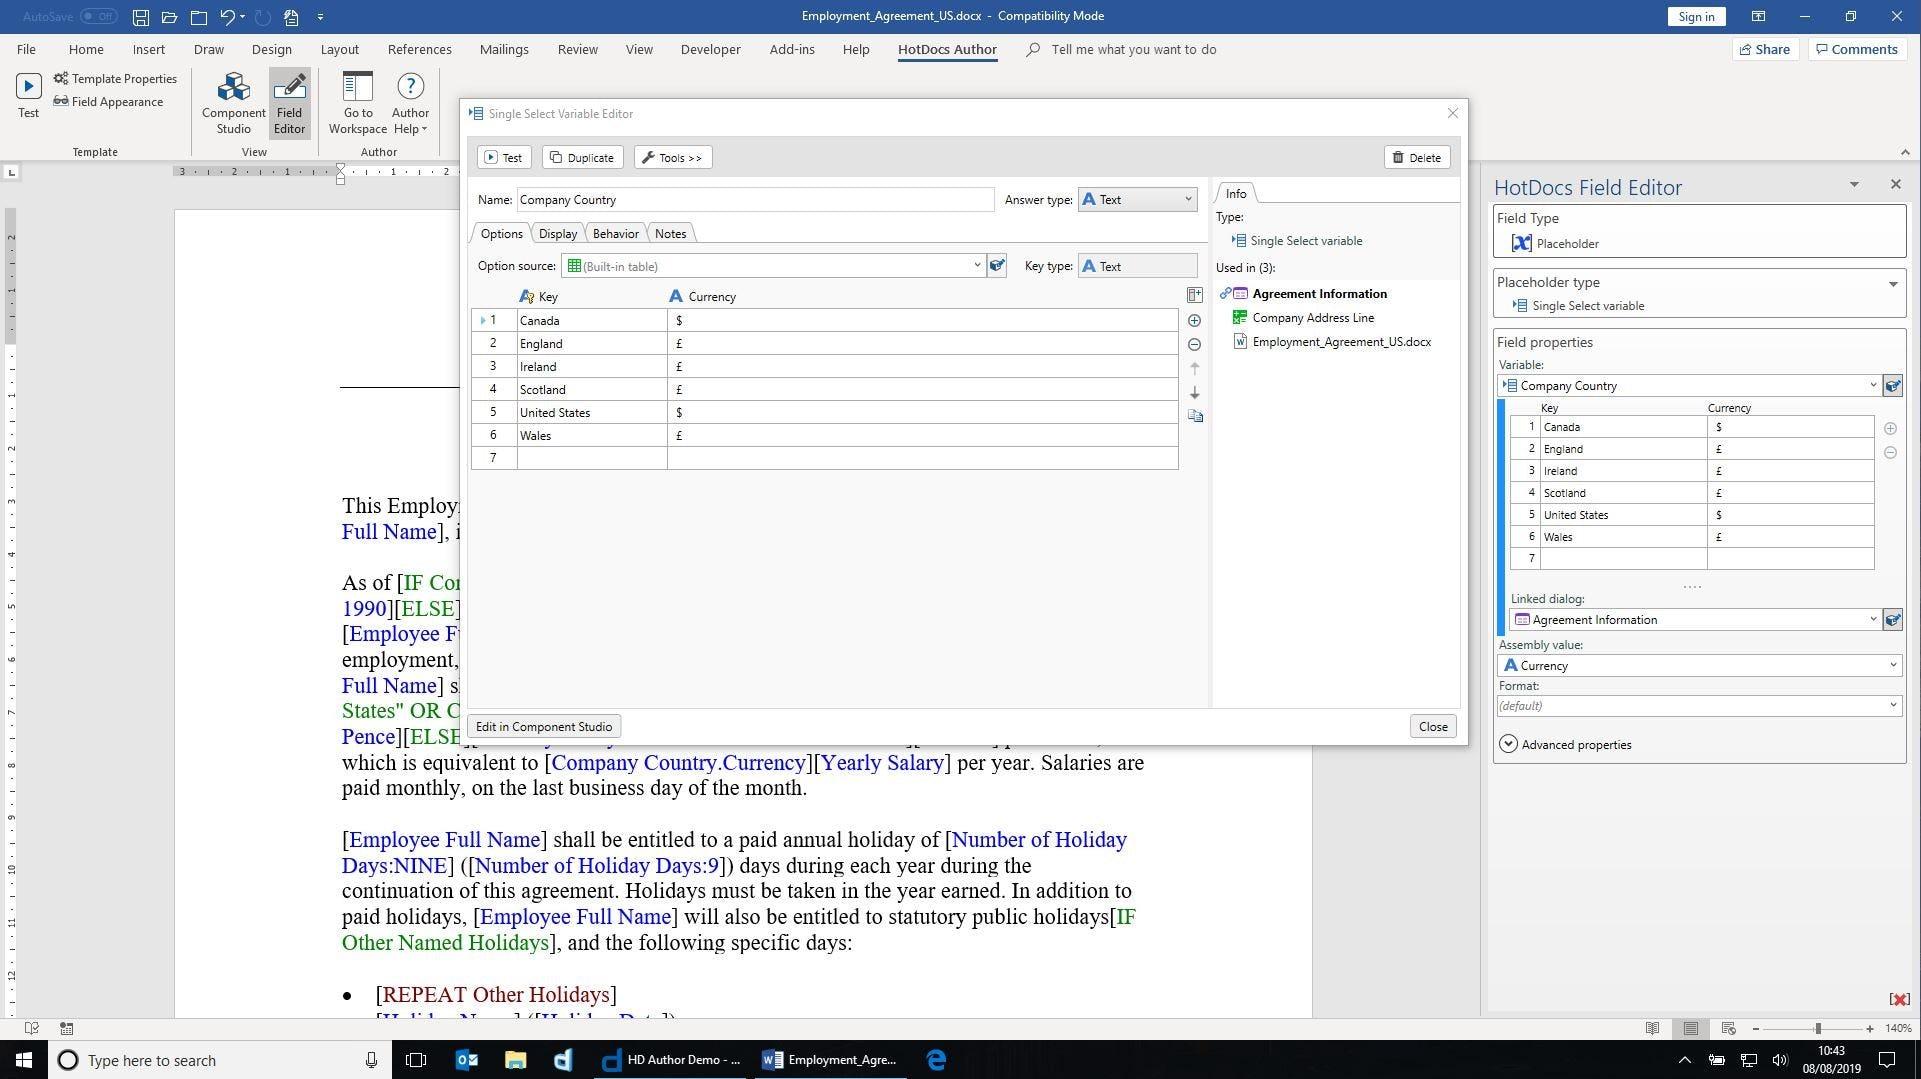 HotDocs Software - Author Field Editor